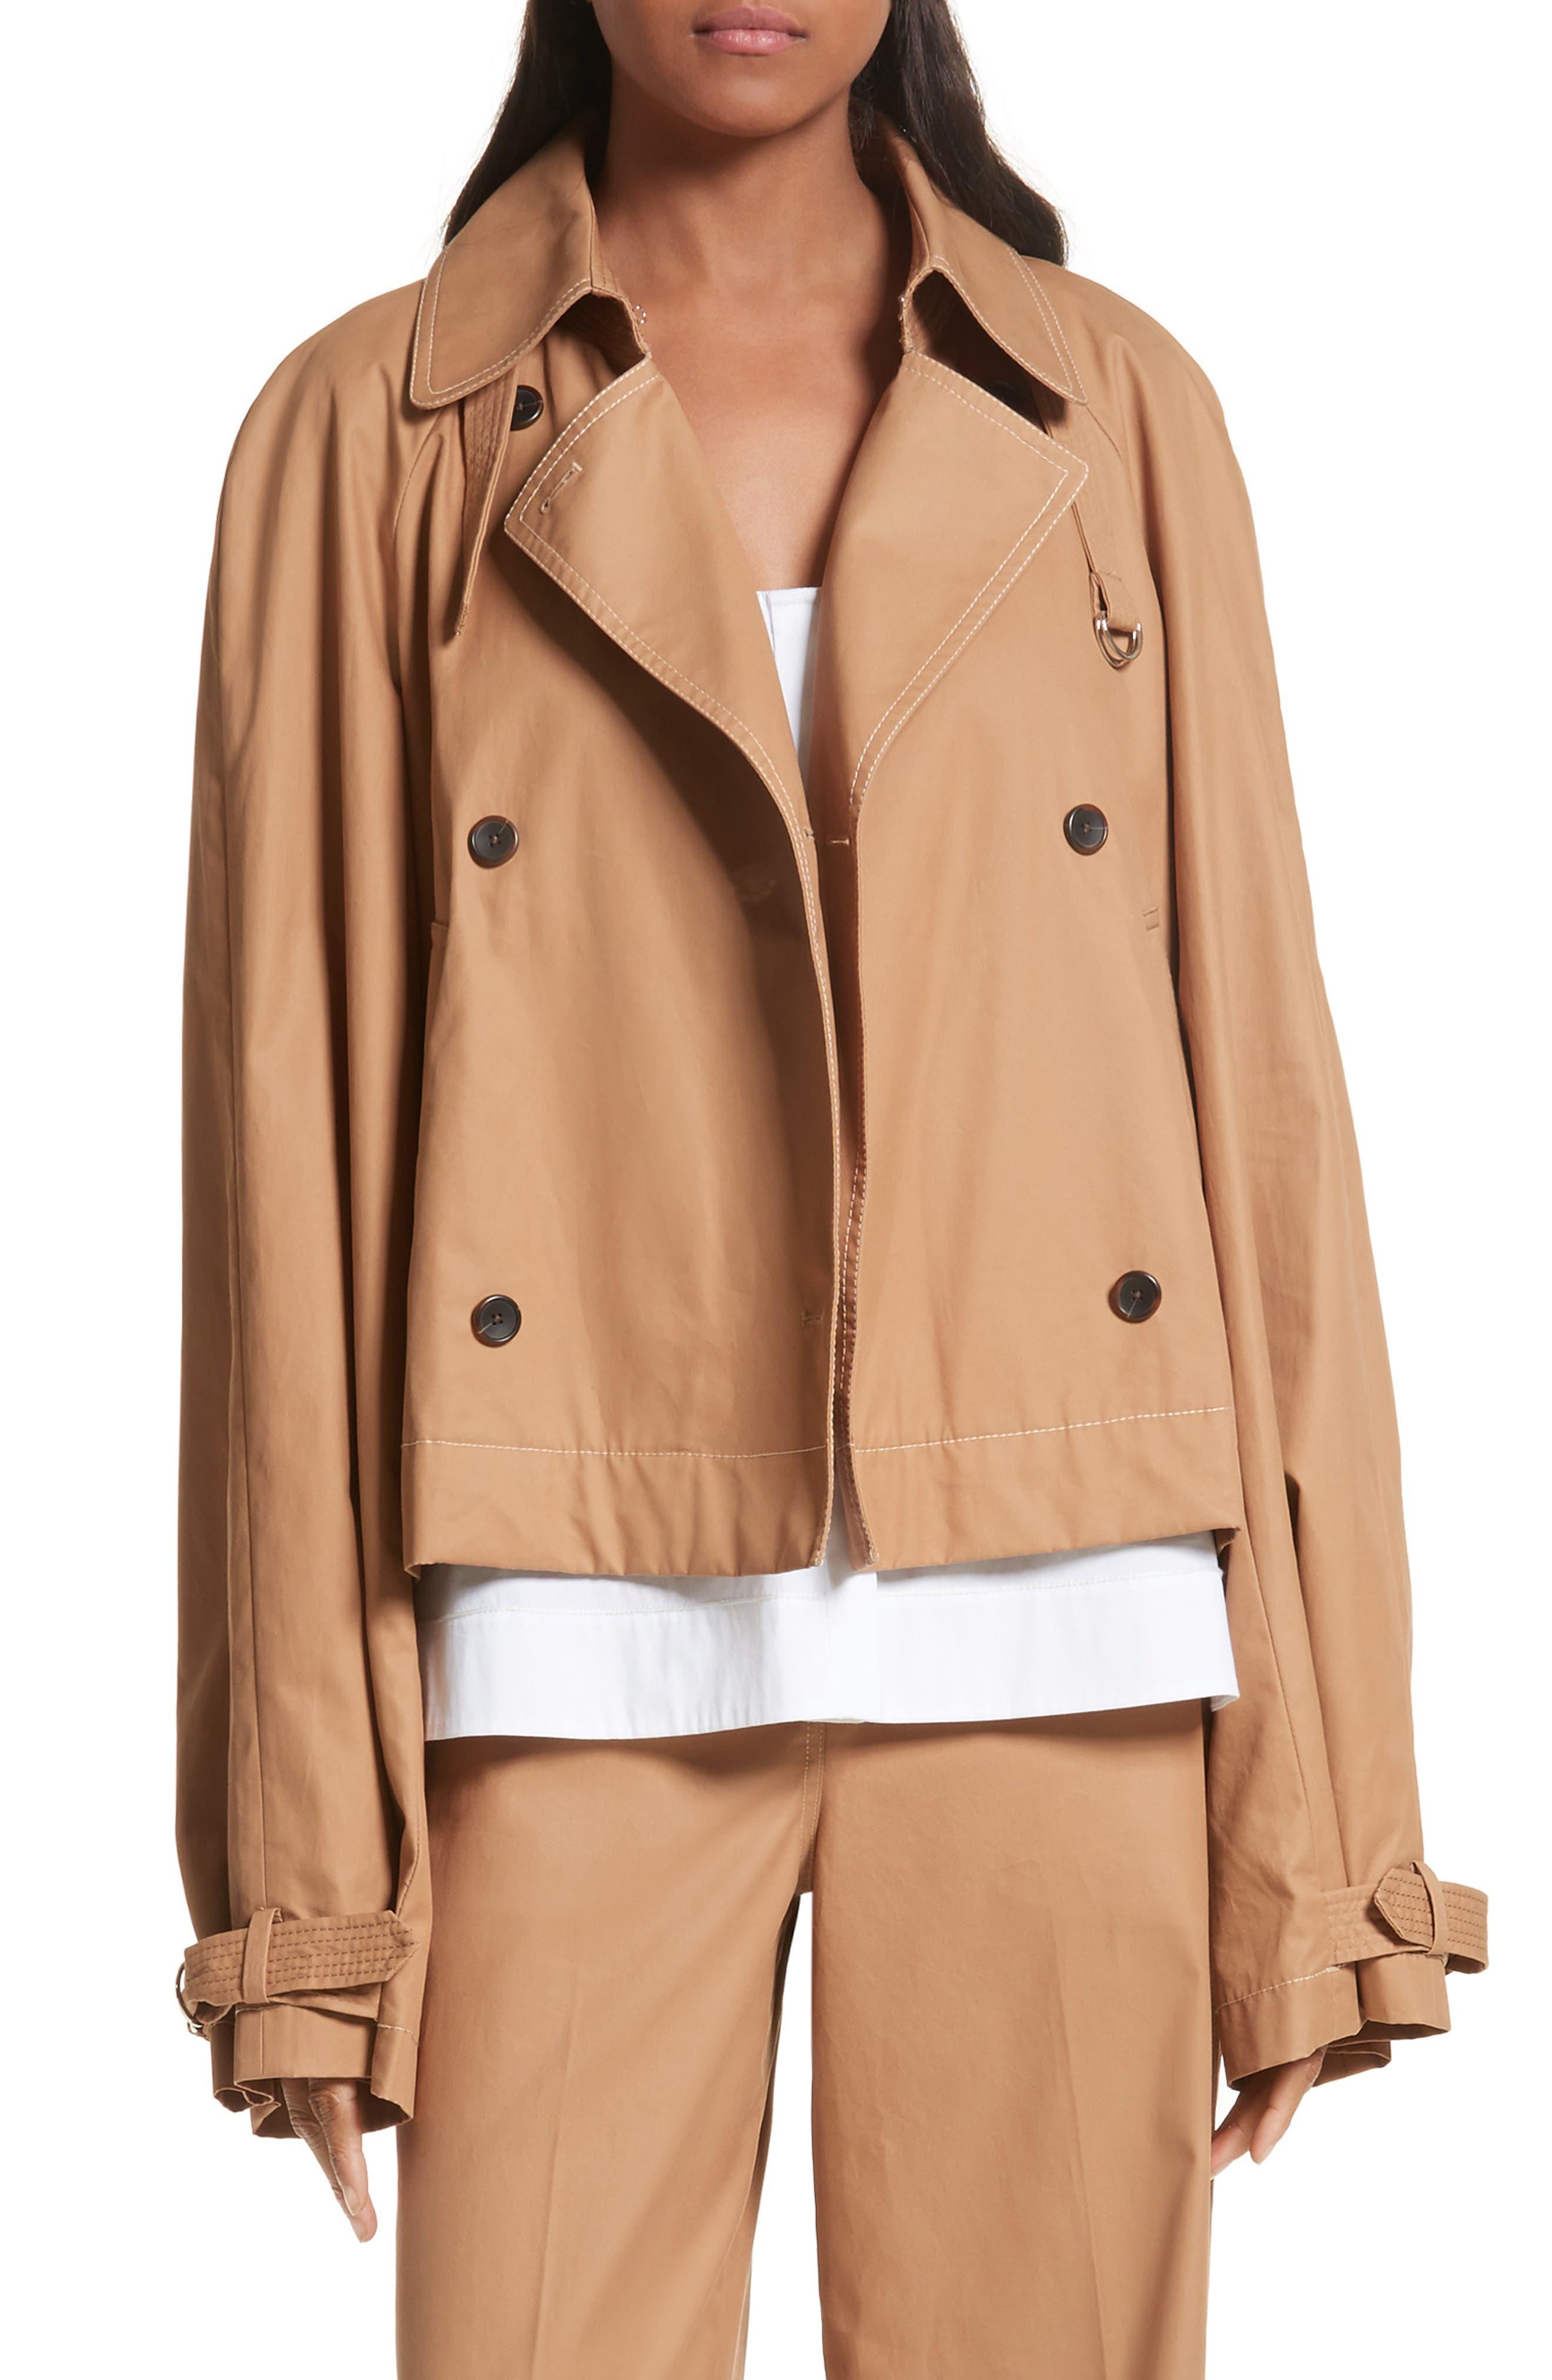 Eleta Short Trench Coat,                             Main thumbnail 1, color,                             206